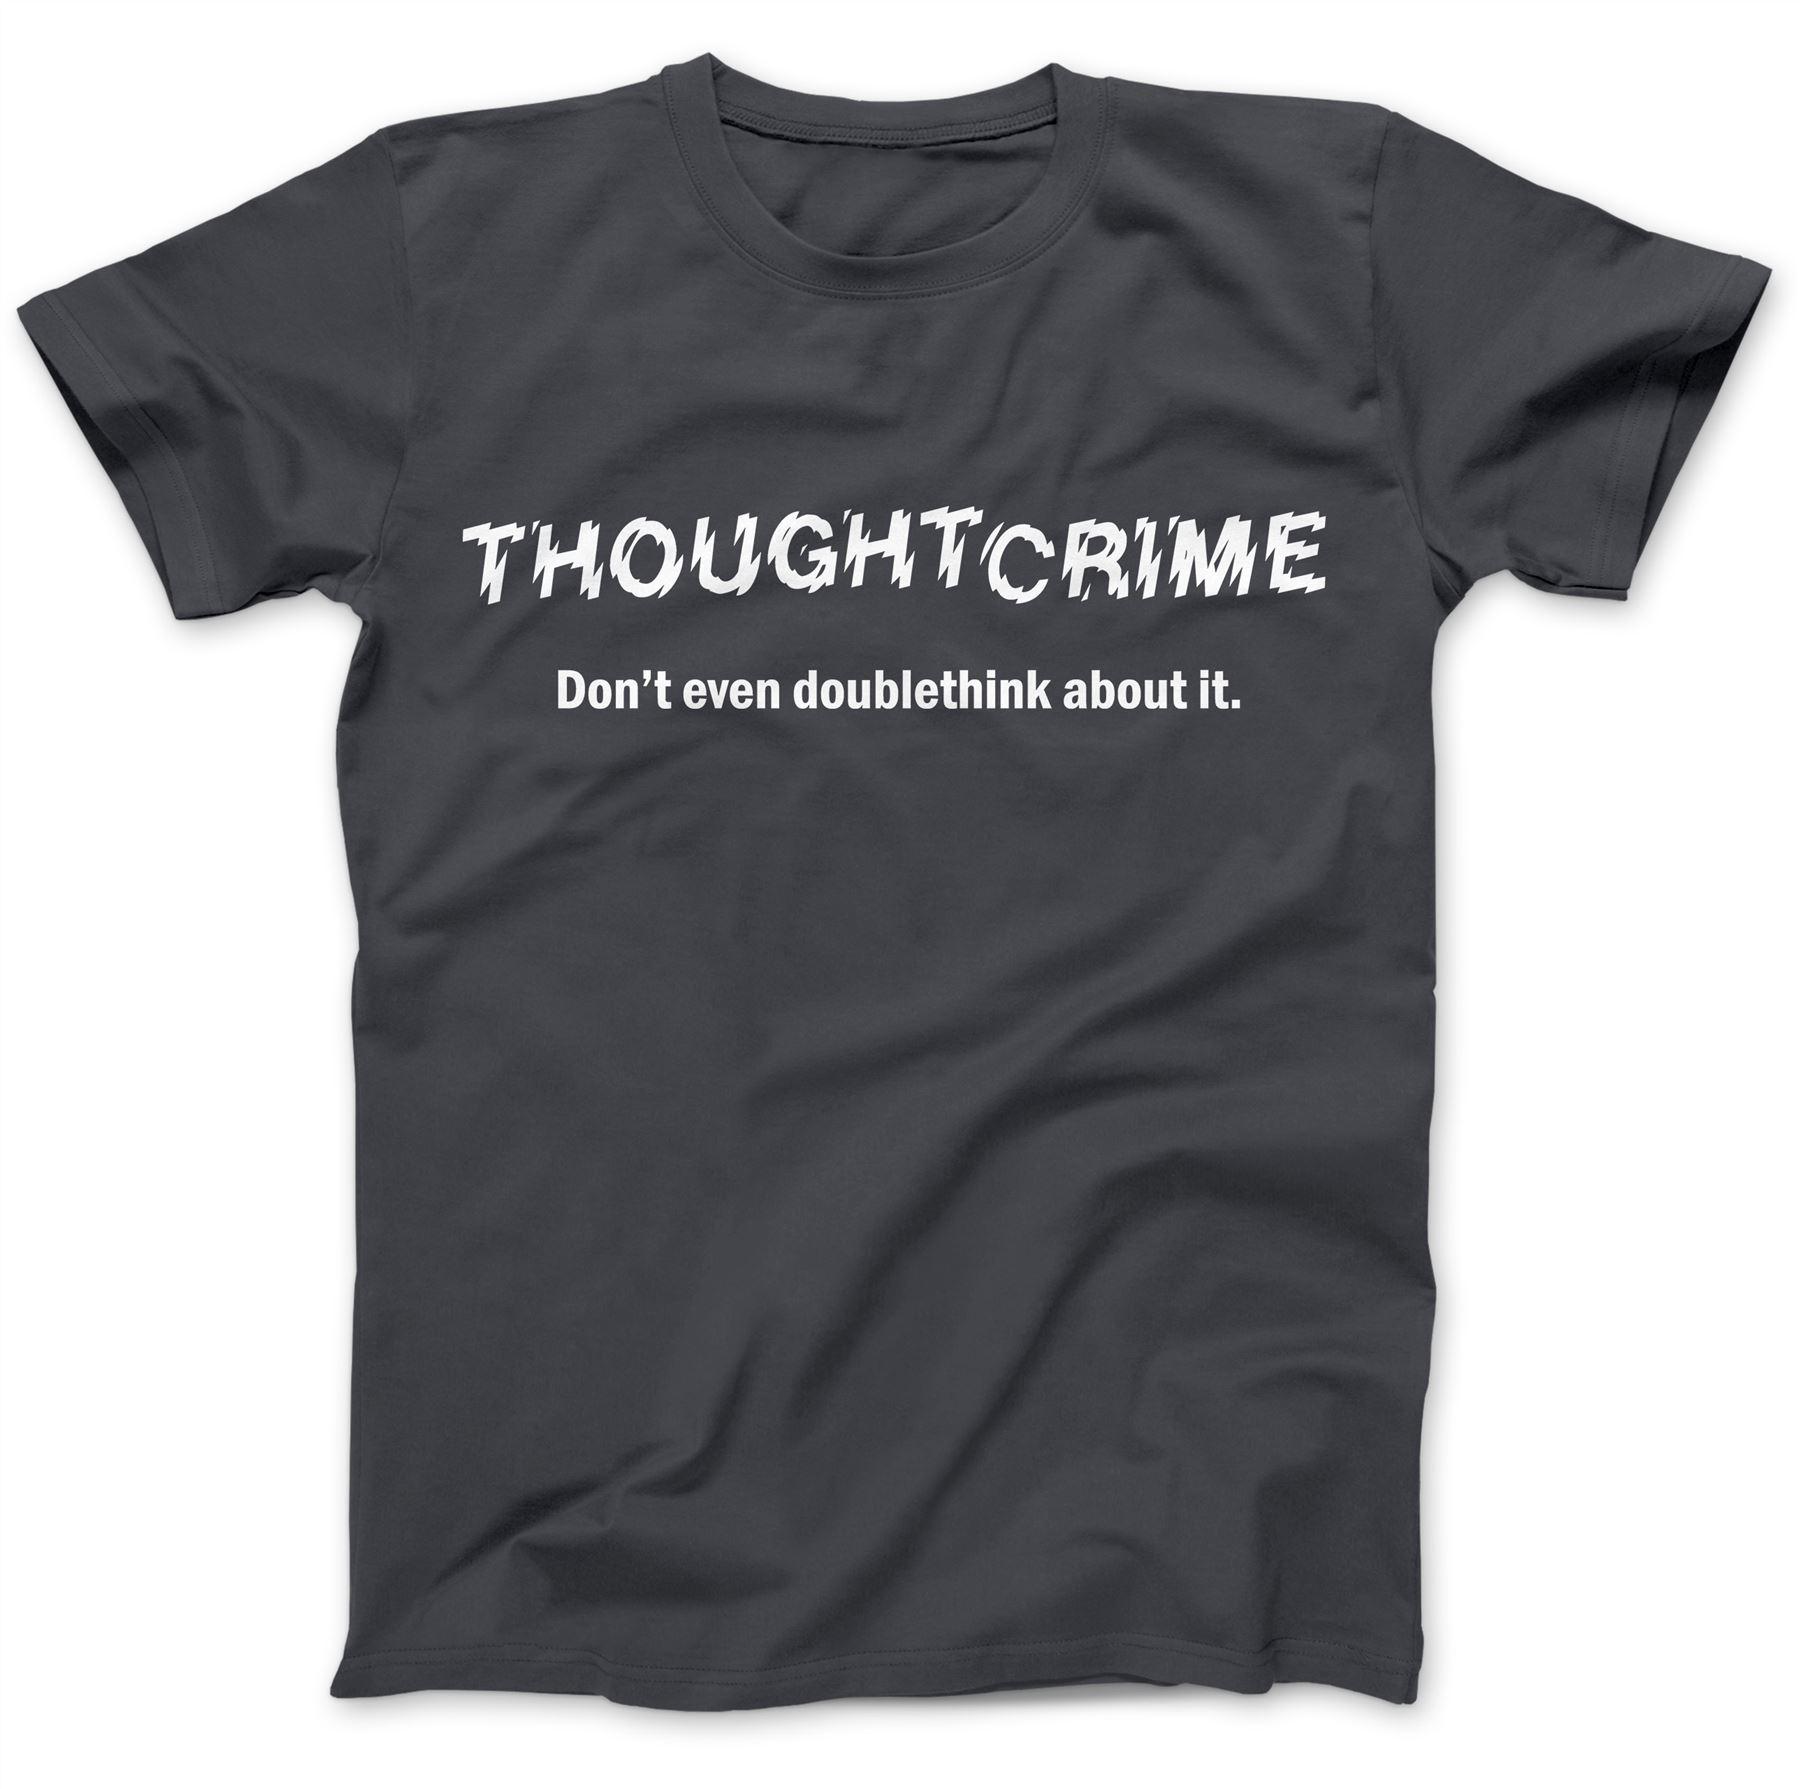 1984-Thought-Crime-George-Orwell-T-Shirt-100-Premium-Cotton-Animal-Farm miniatuur 9